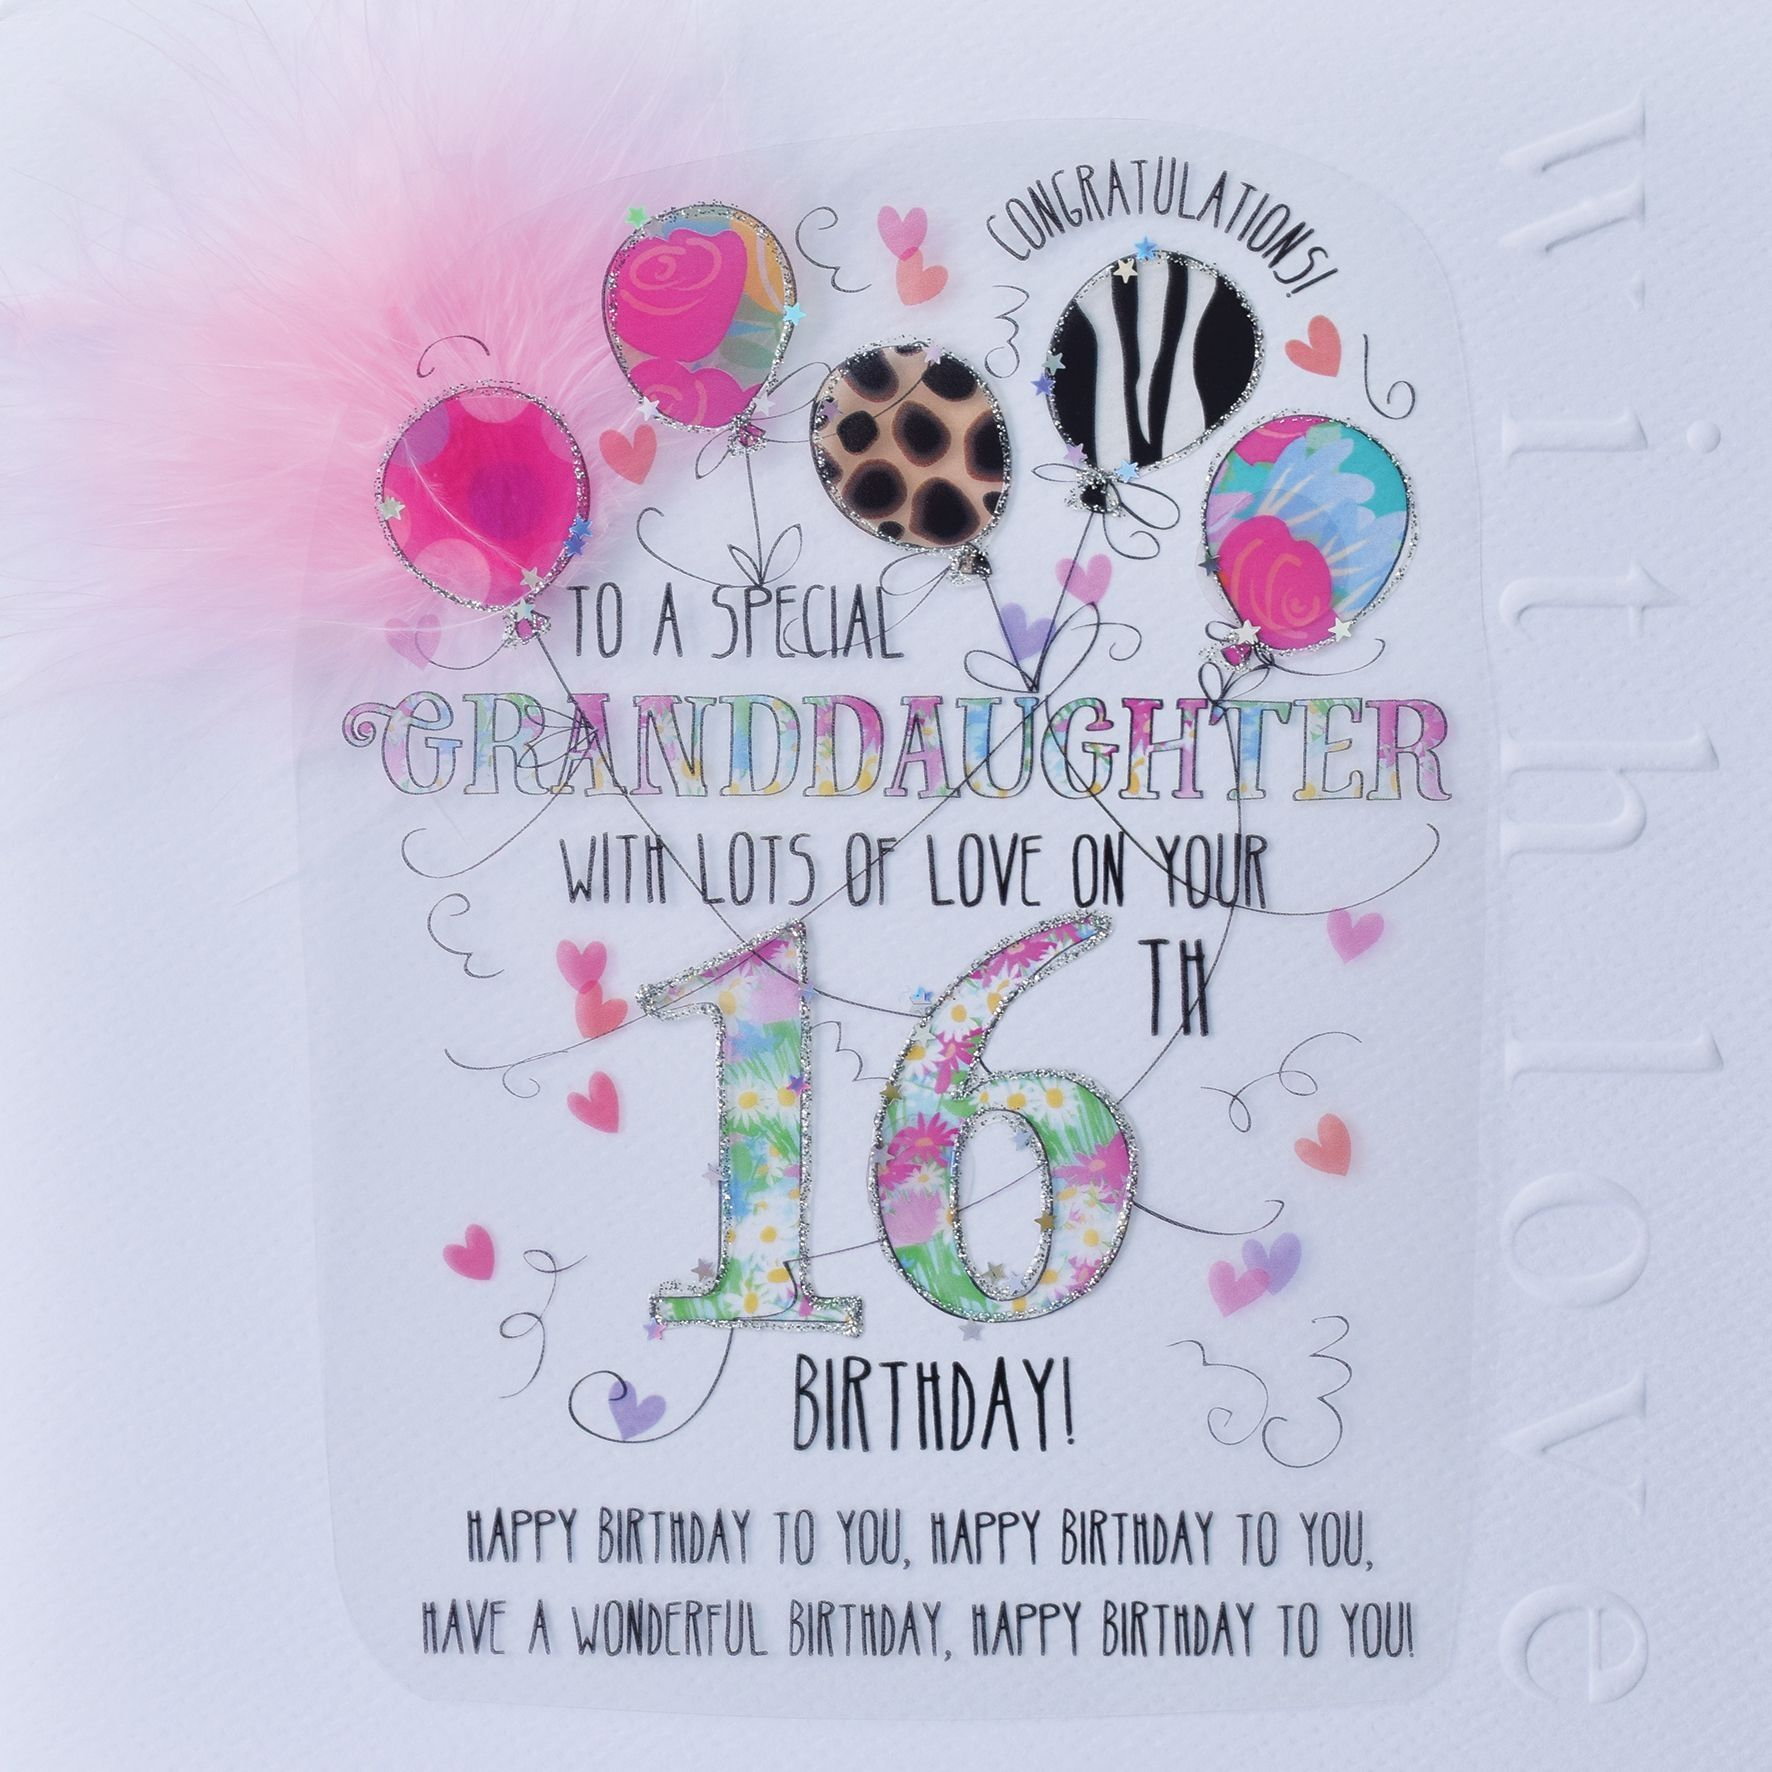 WJB Cloud 30 Granddaughter 30th Birthday Card